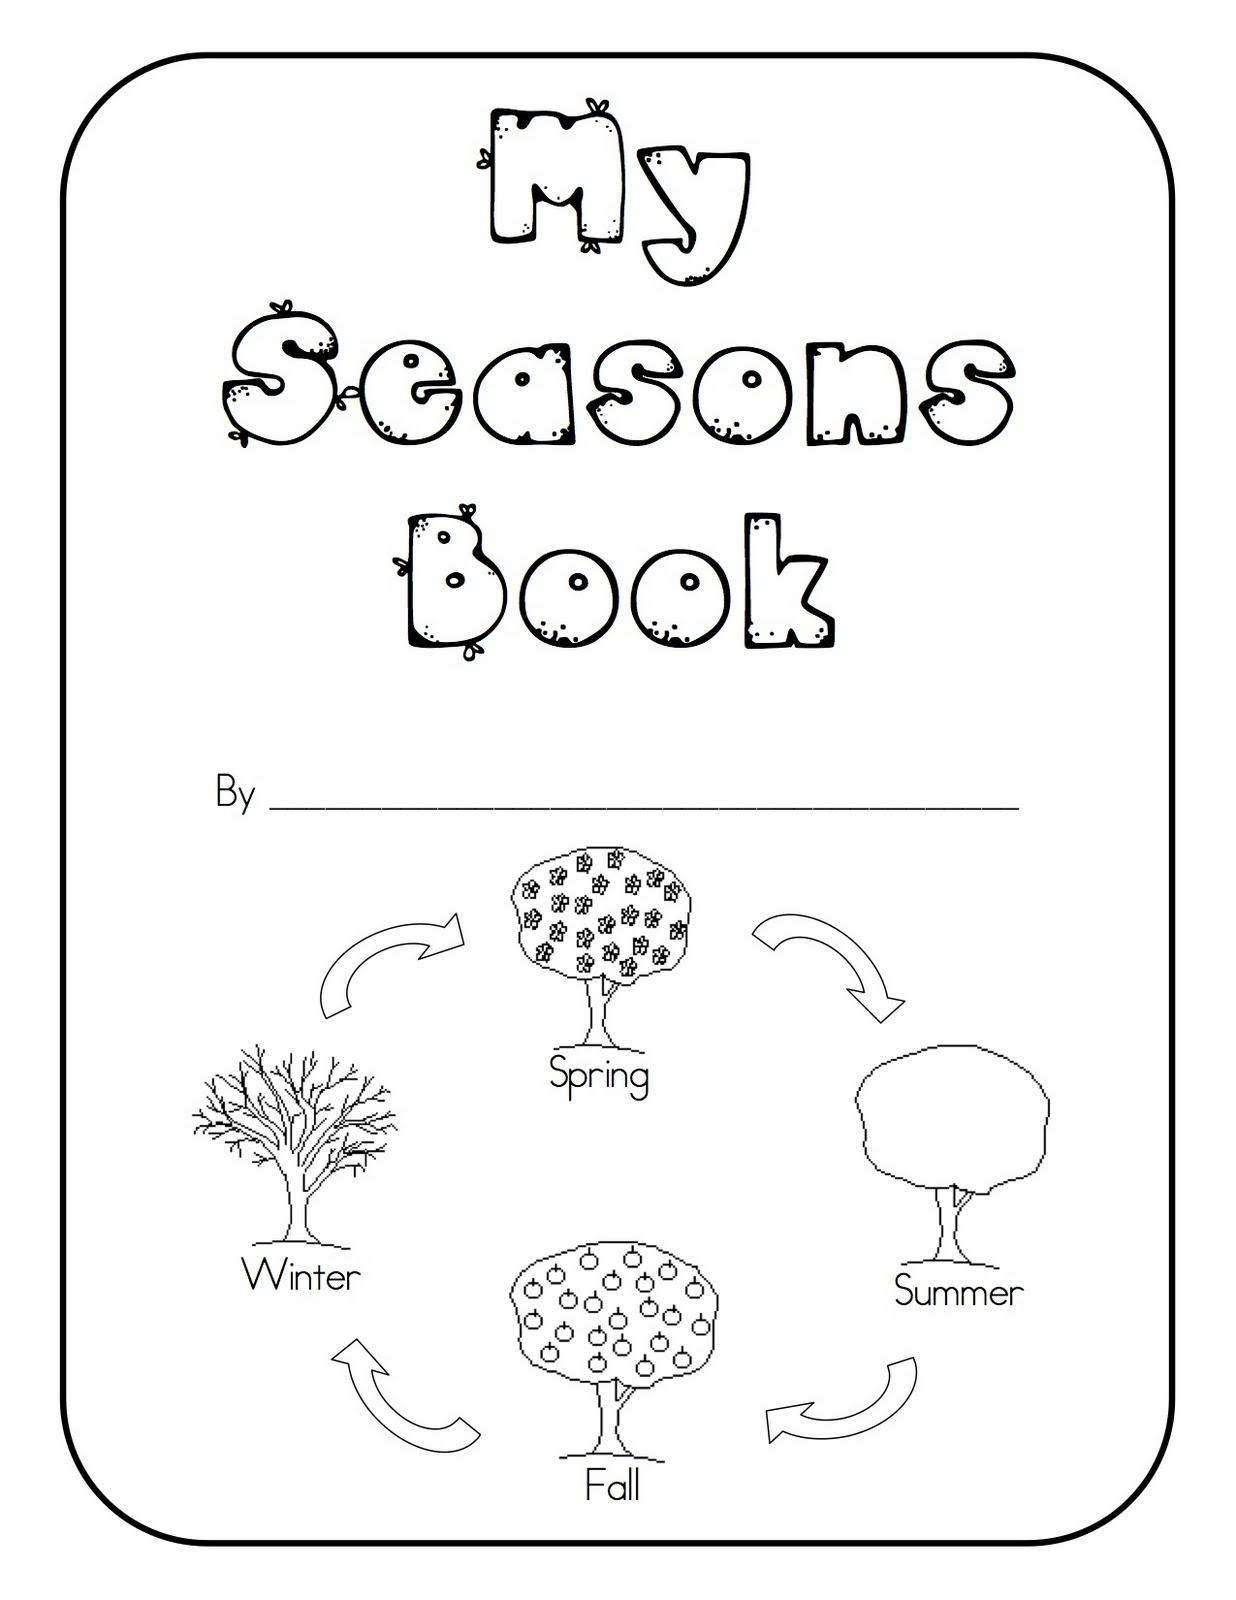 Seasons Printable Activities And Worksheets For Preschool